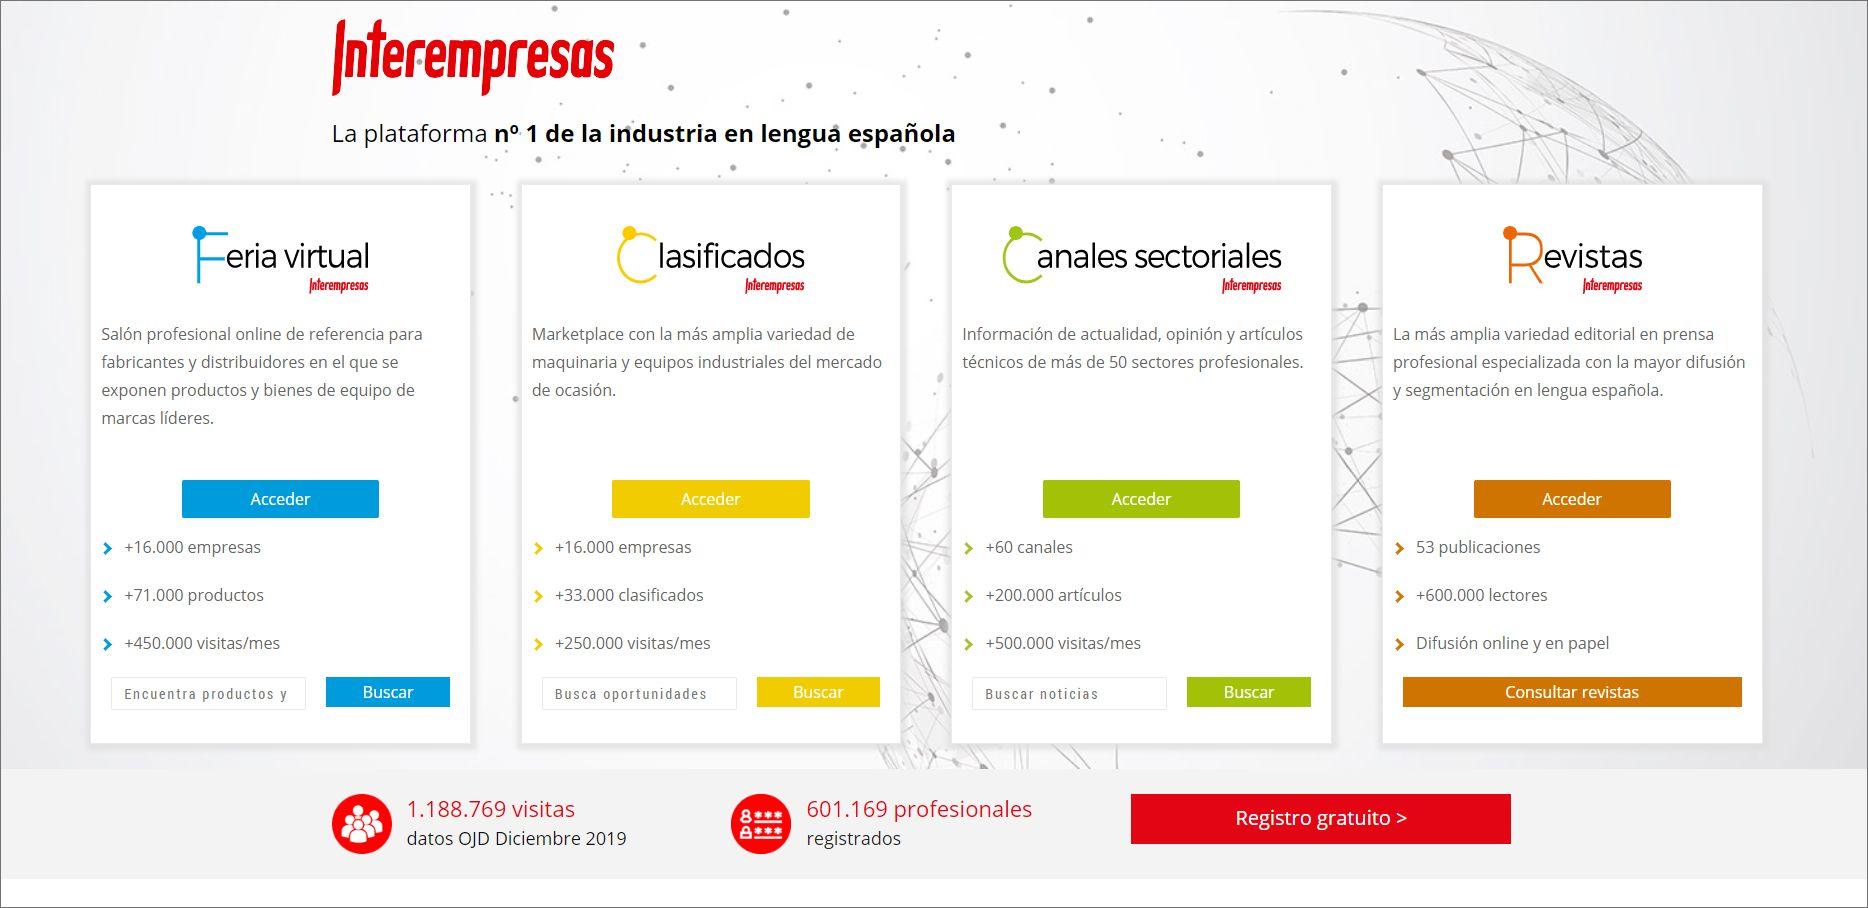 Foto de nueva plataforma digital Interempresas.net